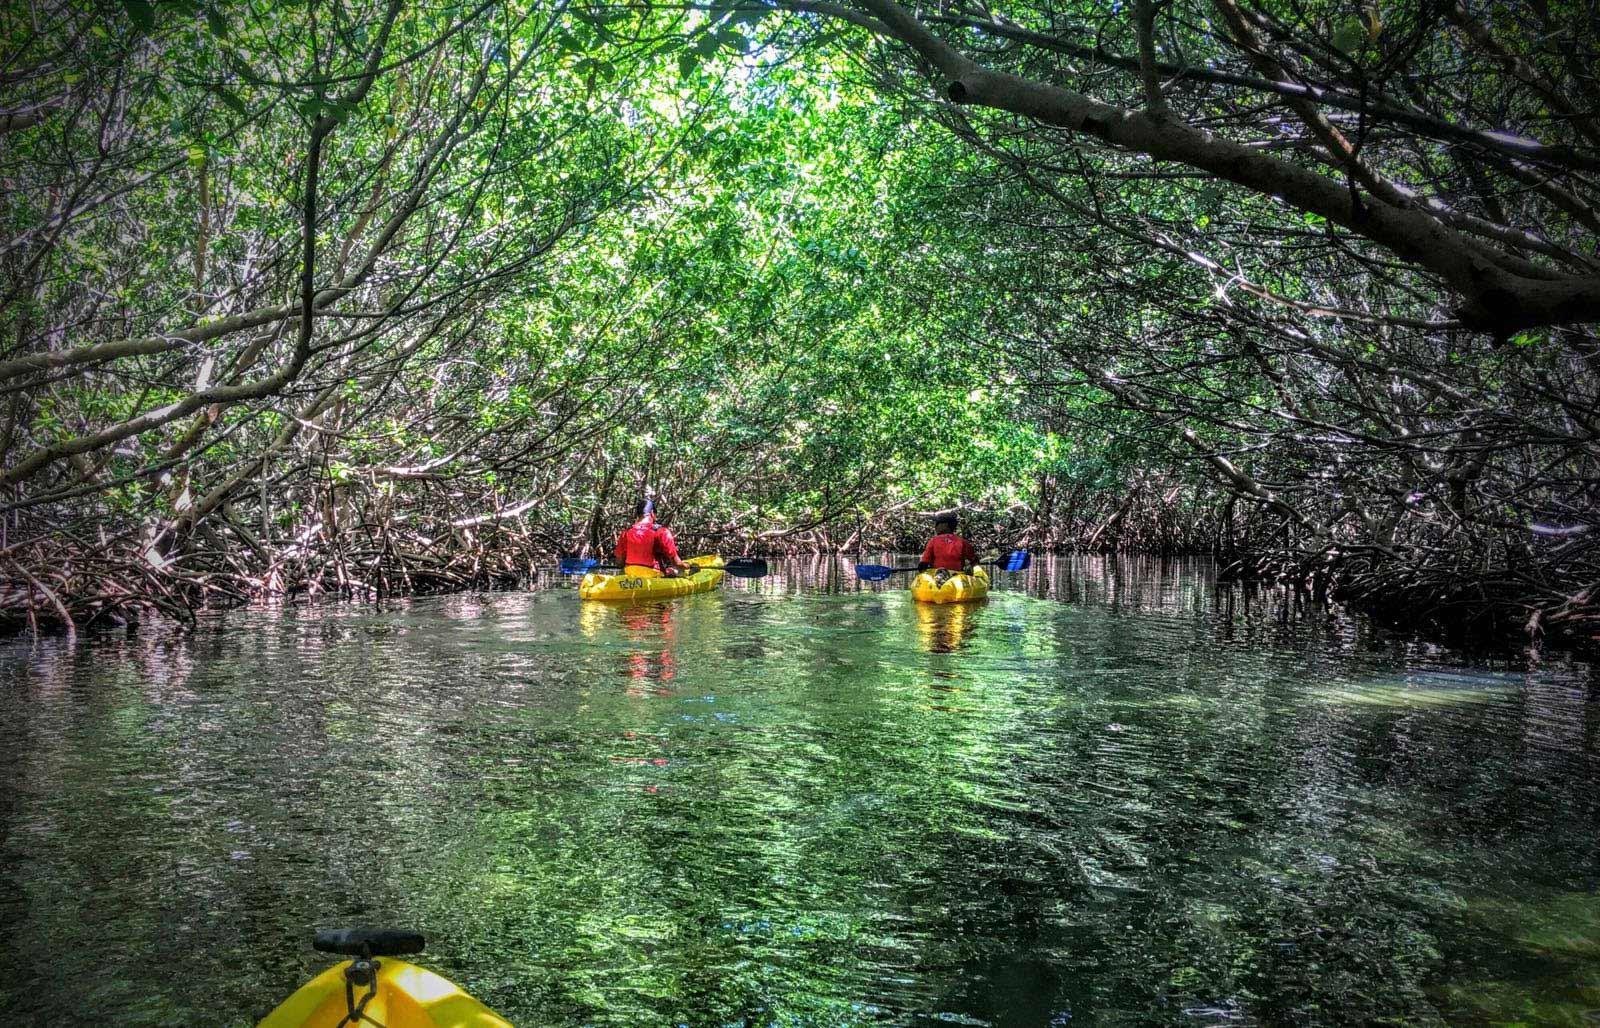 Kayakers entering the Fajardo Bio Bay through a red mangrove channel with Kayaking Puerto Rico Bioluminescence Kayak Tour